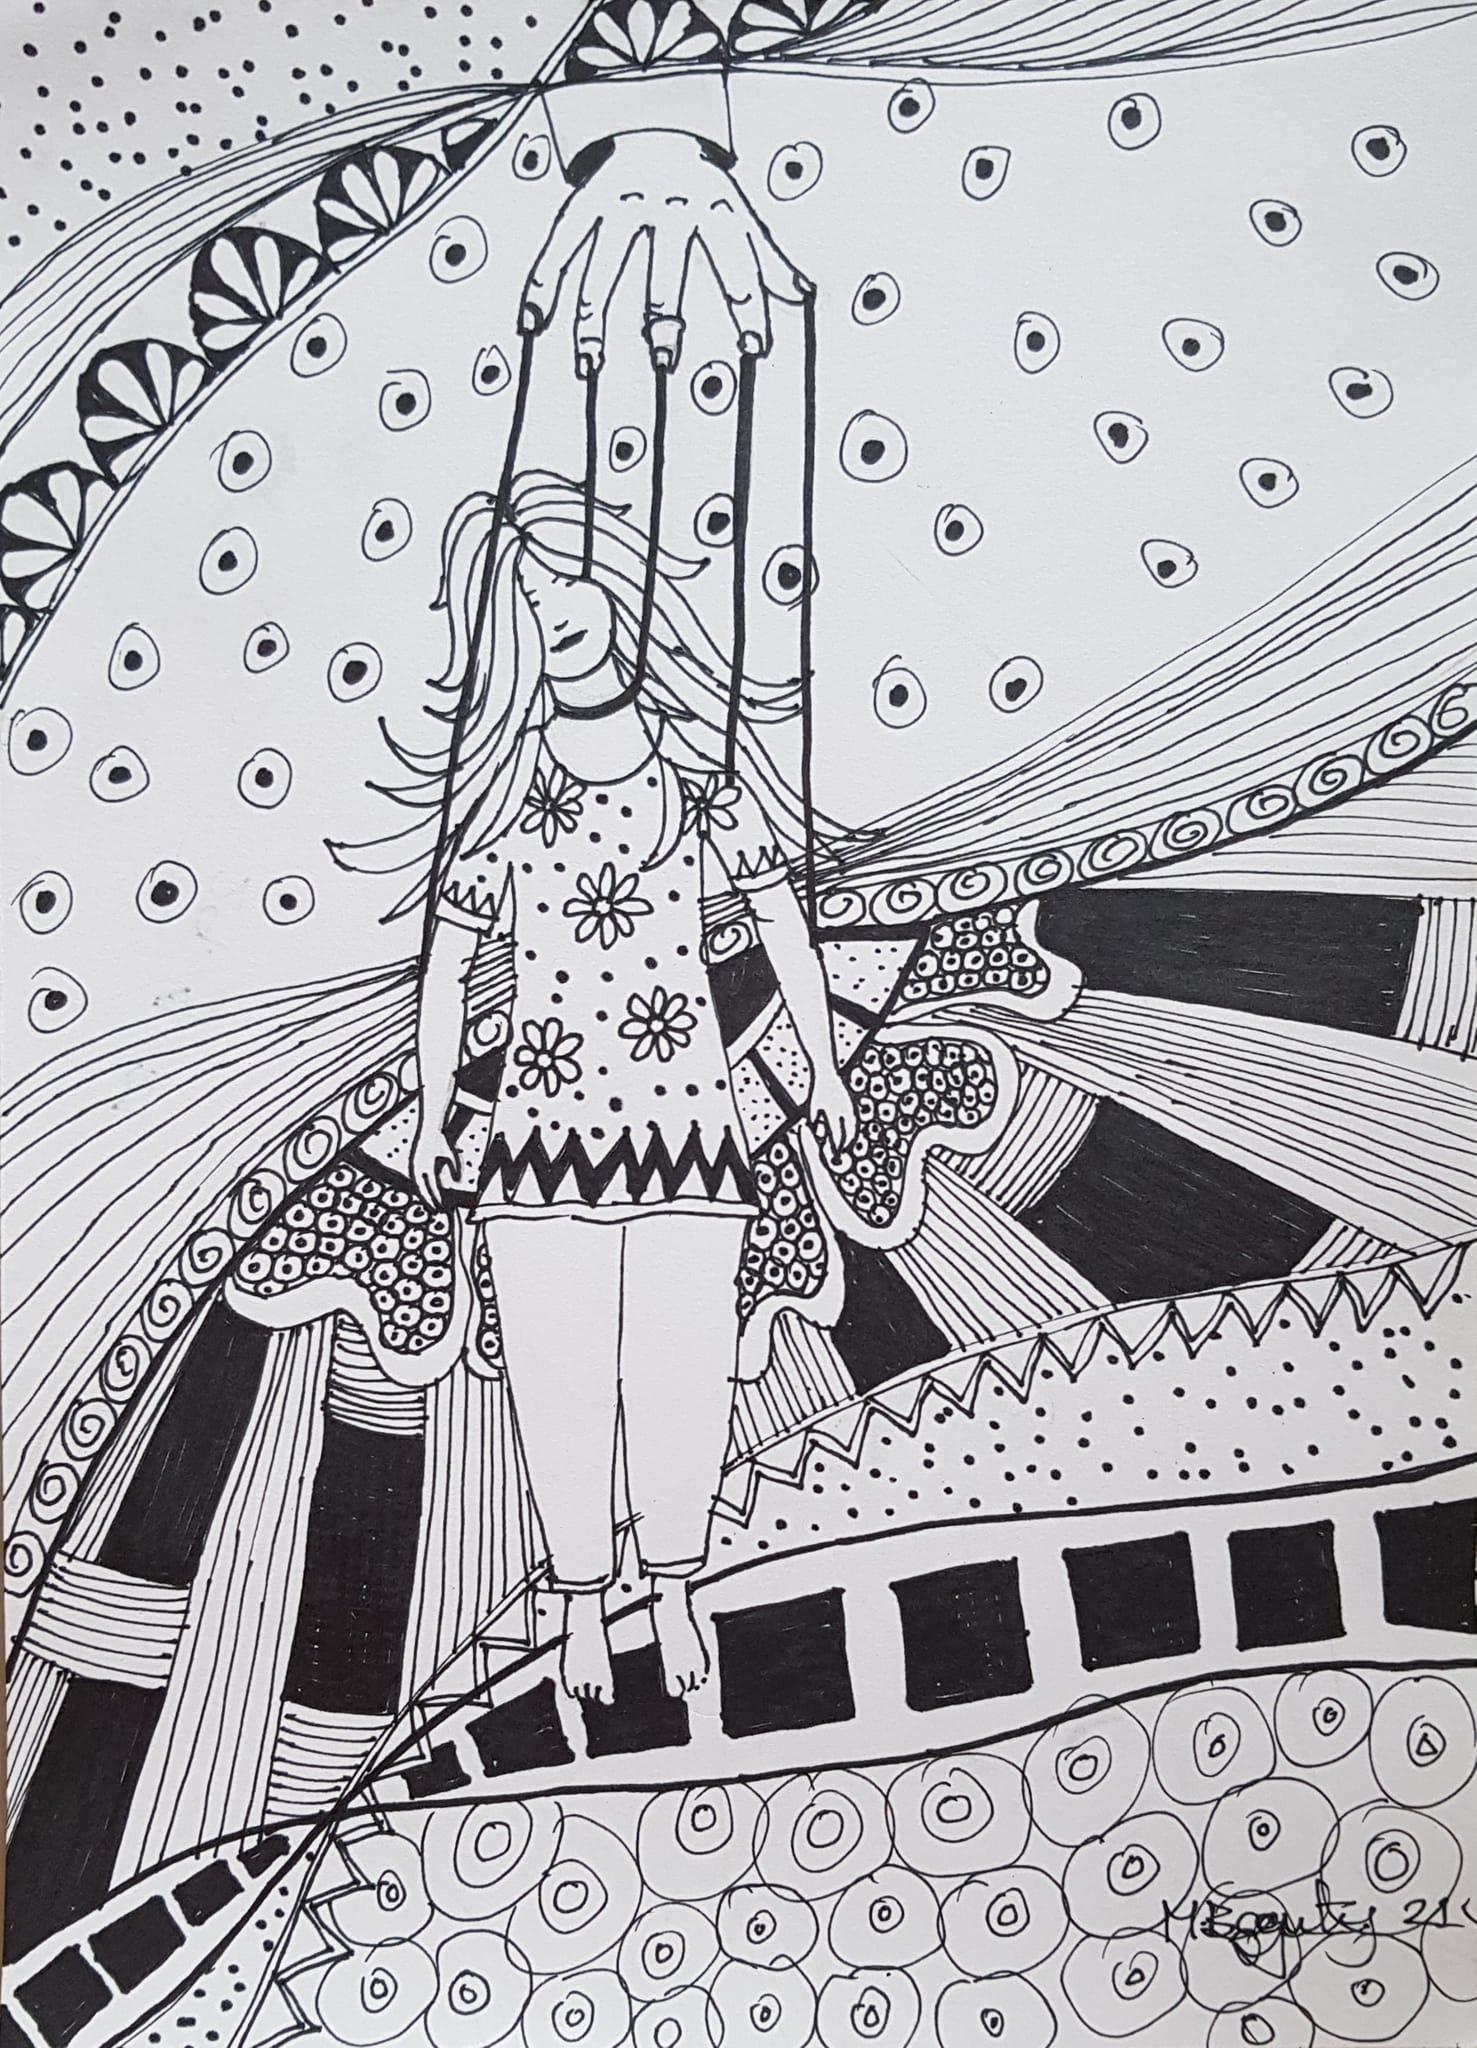 Mahfuza Begum- Art Expression about Munia's Suicide